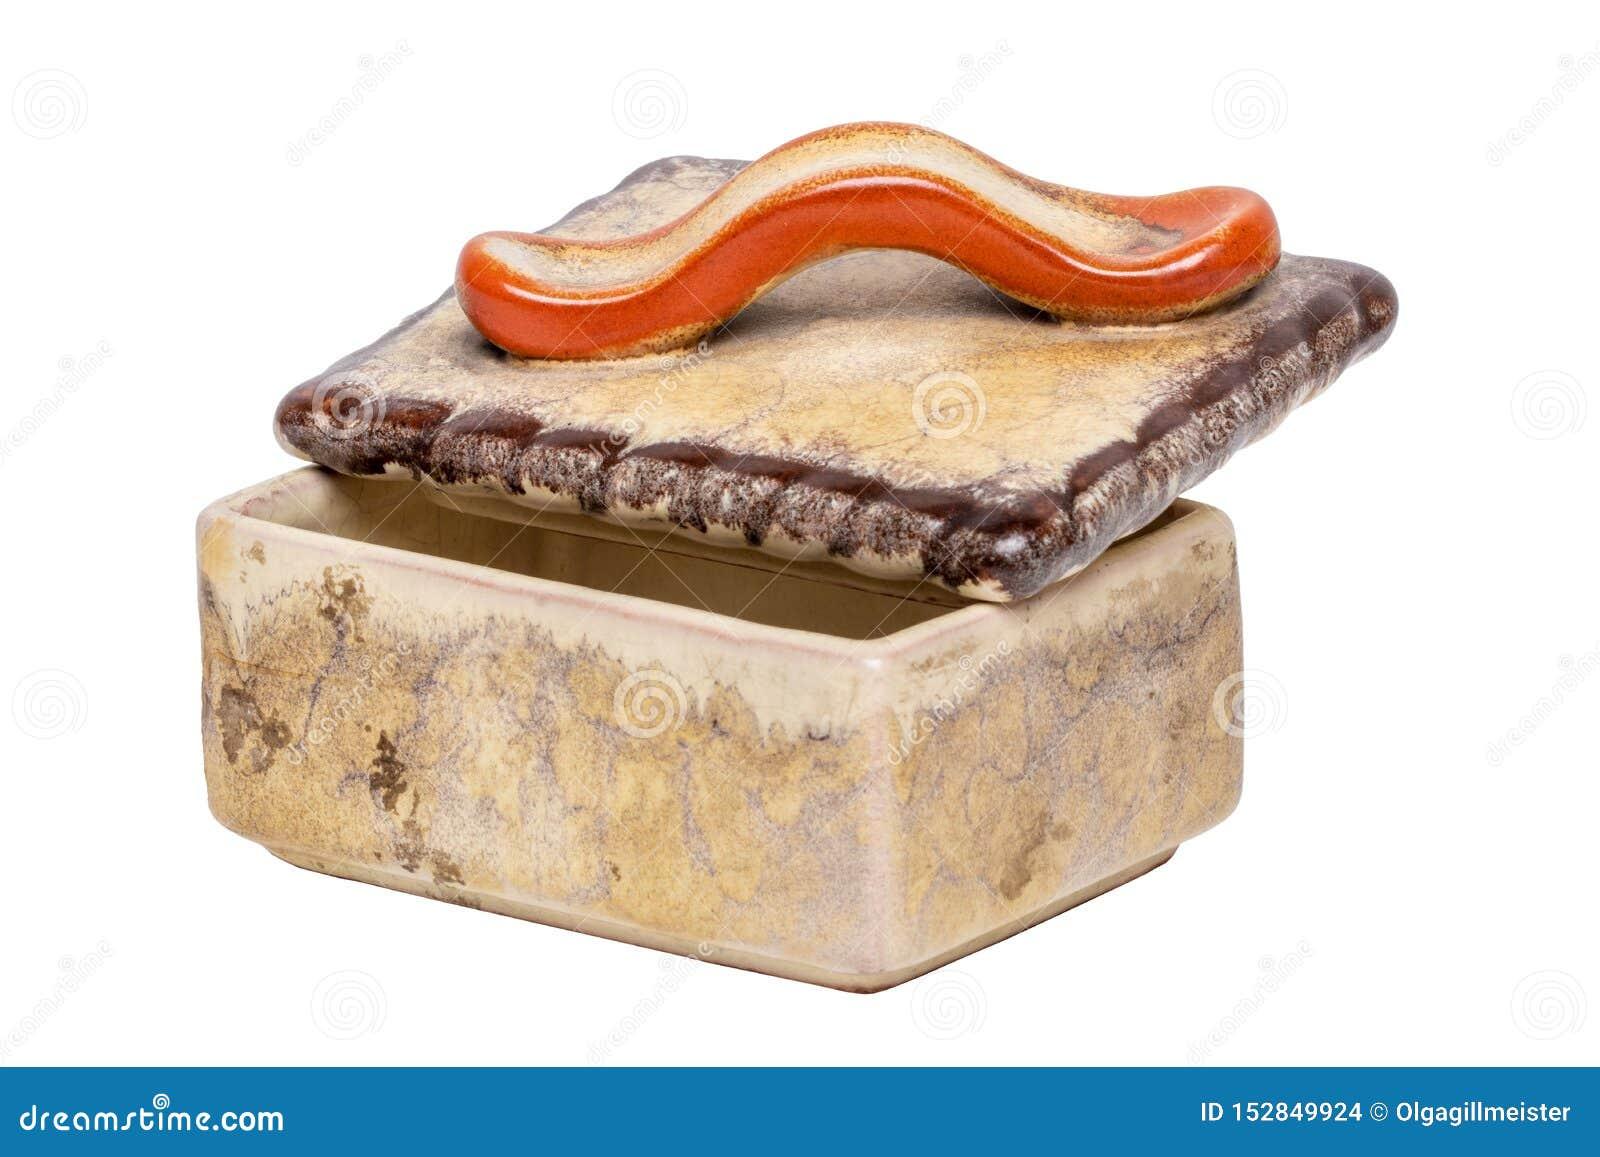 Caja del cigarrillo aislada Primer de la caja de cigarrillo marrón antigua con una manija roja hecha de cerámica aislada en un fo